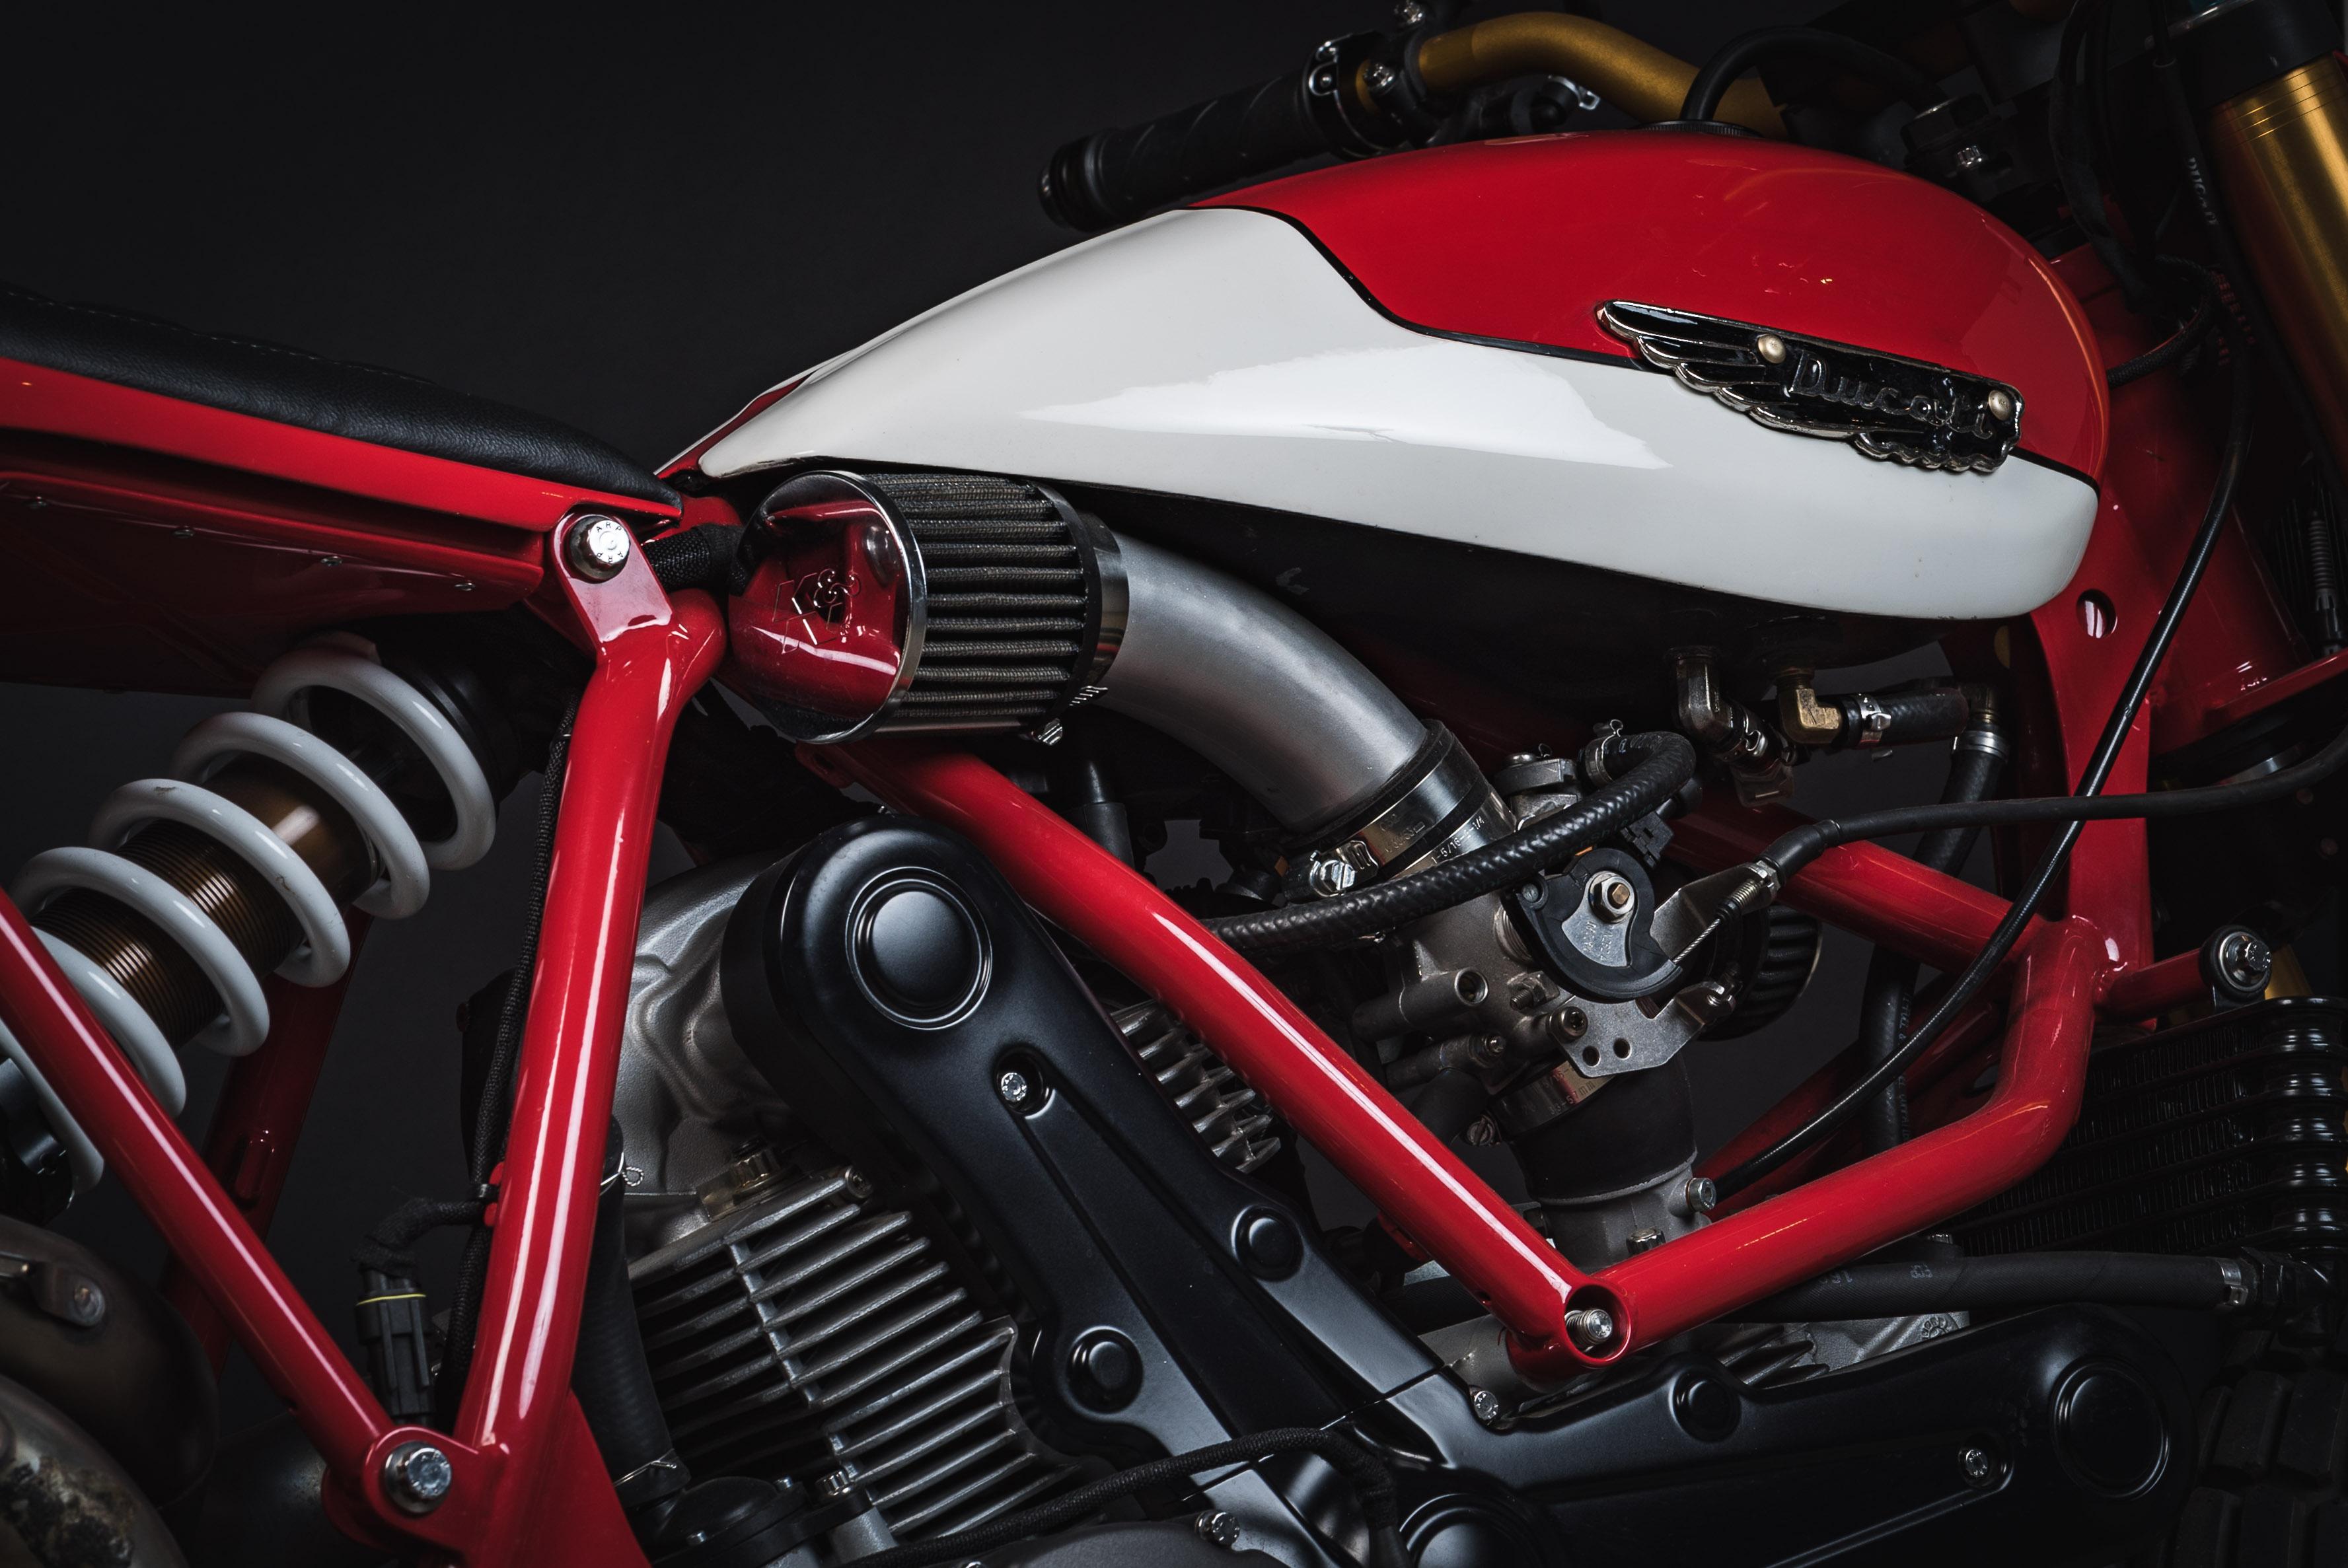 Fuller Moto Ducati Tracker - Lloyd Brothers